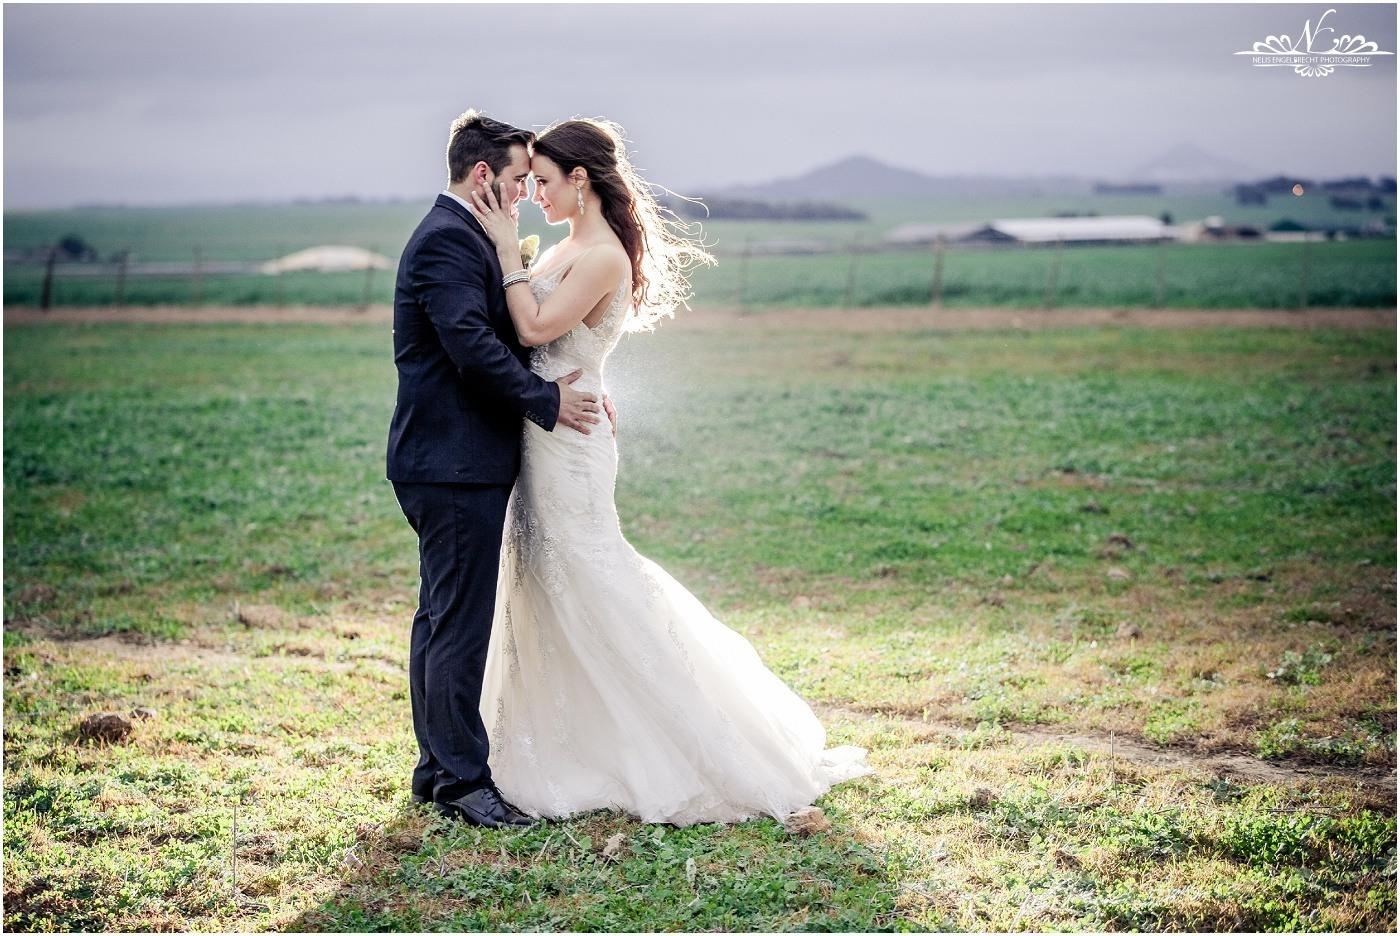 Eensgezind-Wedding-Photos-Nelis-Engelbrecht-Photography-161